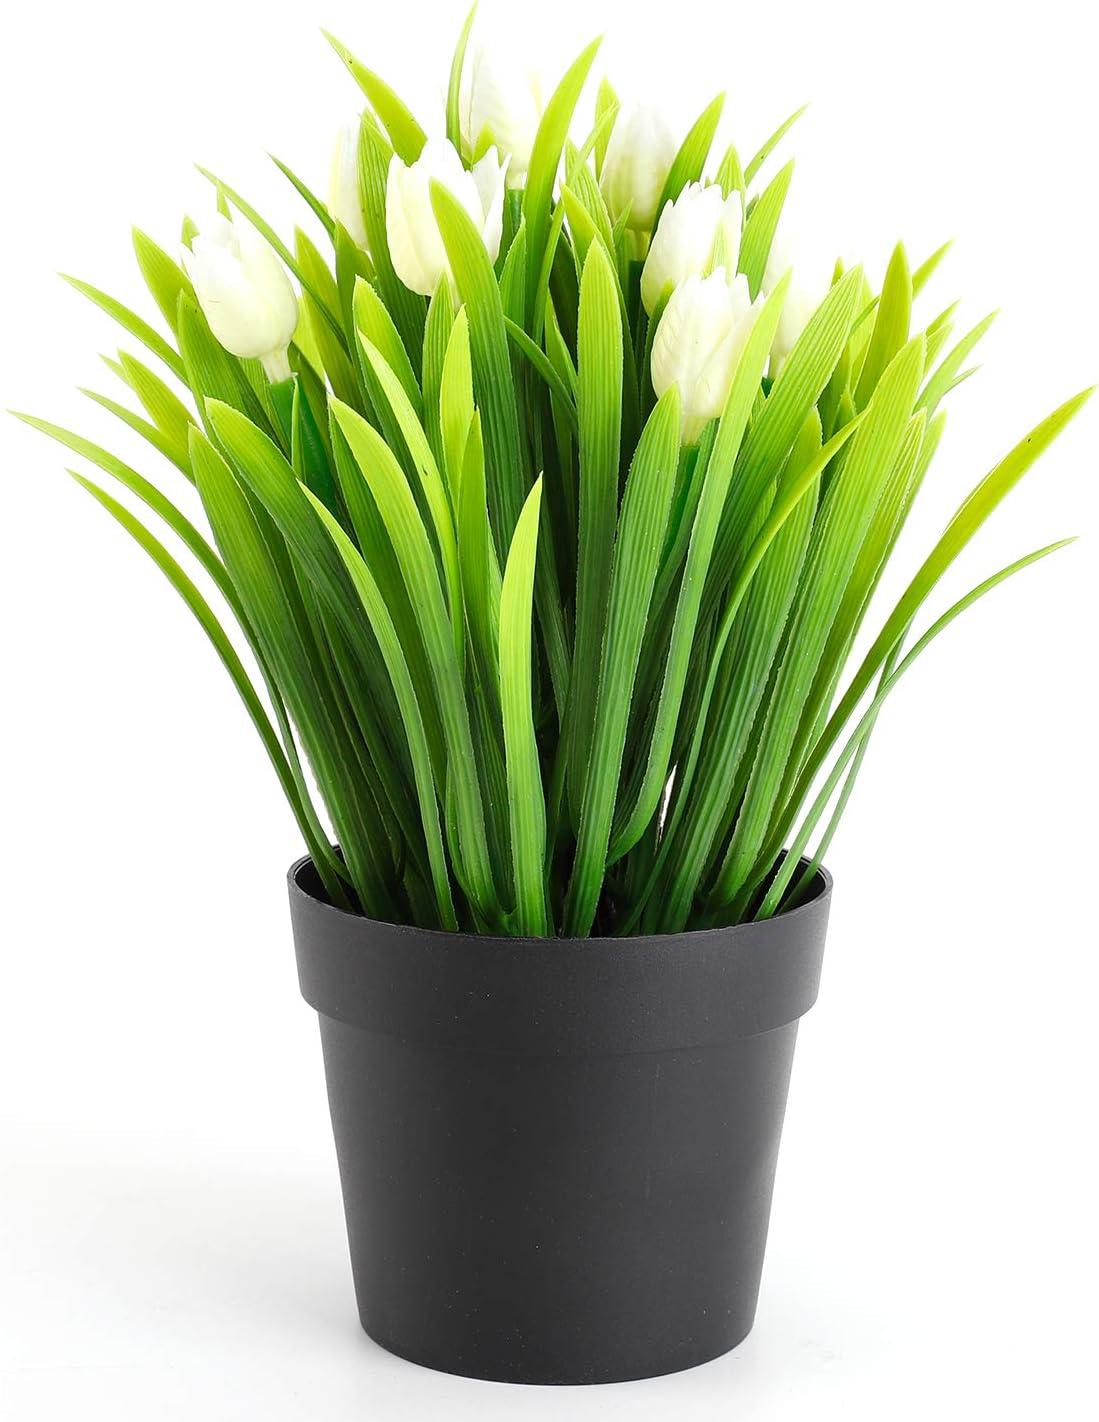 WOODWORD Artificial Plants for Room Decor - Potted Fake Plants for Home Decor - Face Plants in Black Pots for Bathroom Decor Office Decor